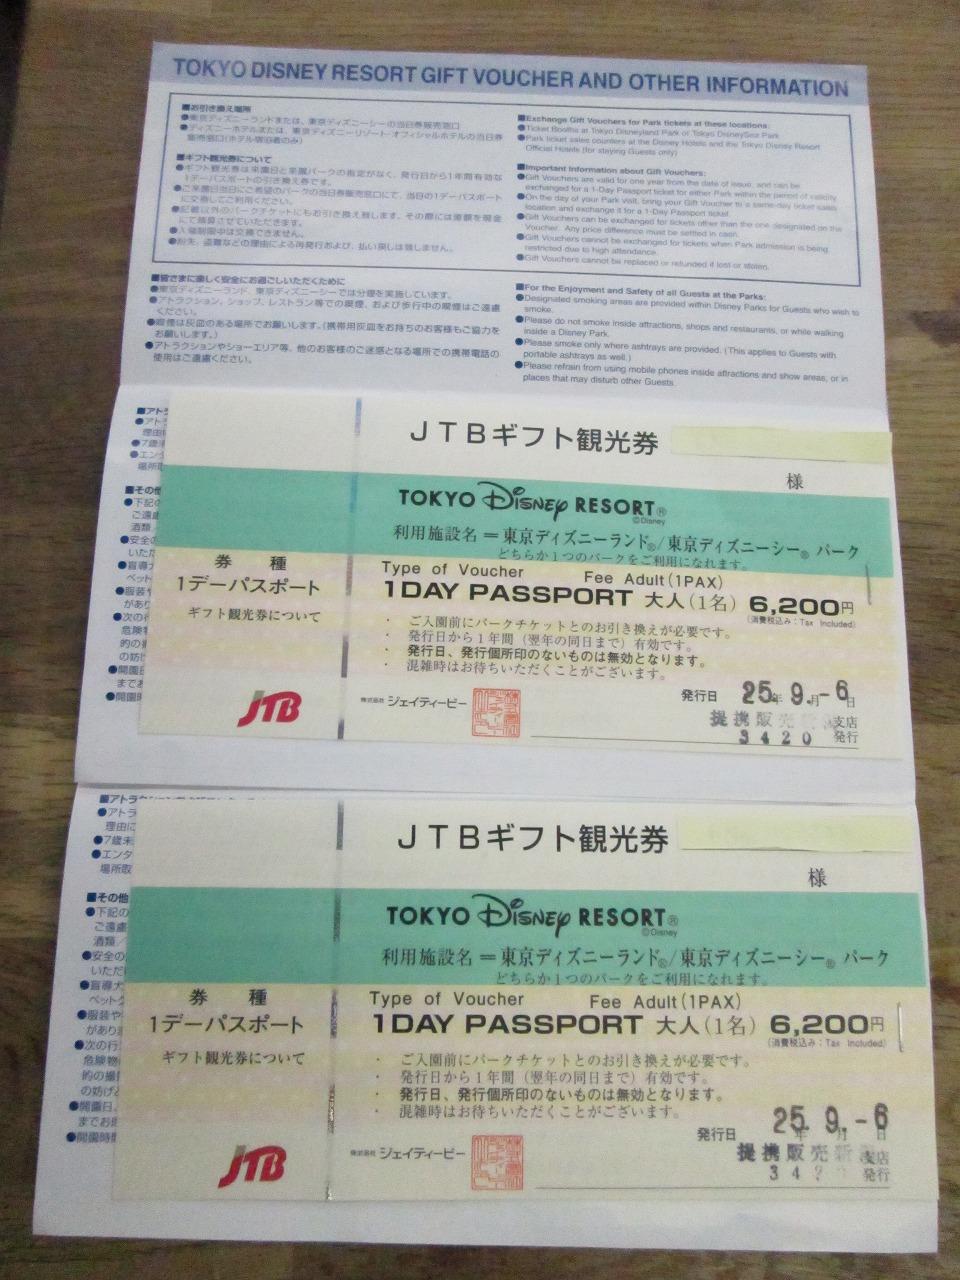 tdr 東京ディズニーランド】ディズニーシー 1day パスポート jtb ギフト